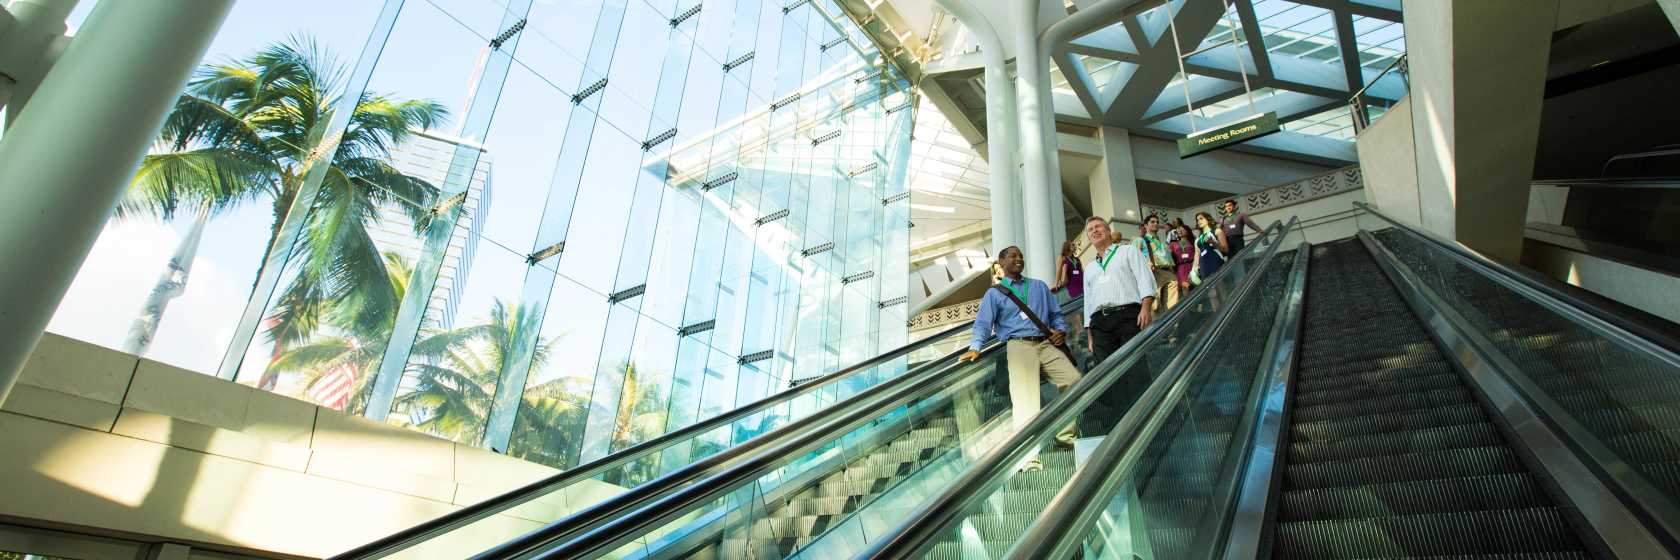 HCC escalator